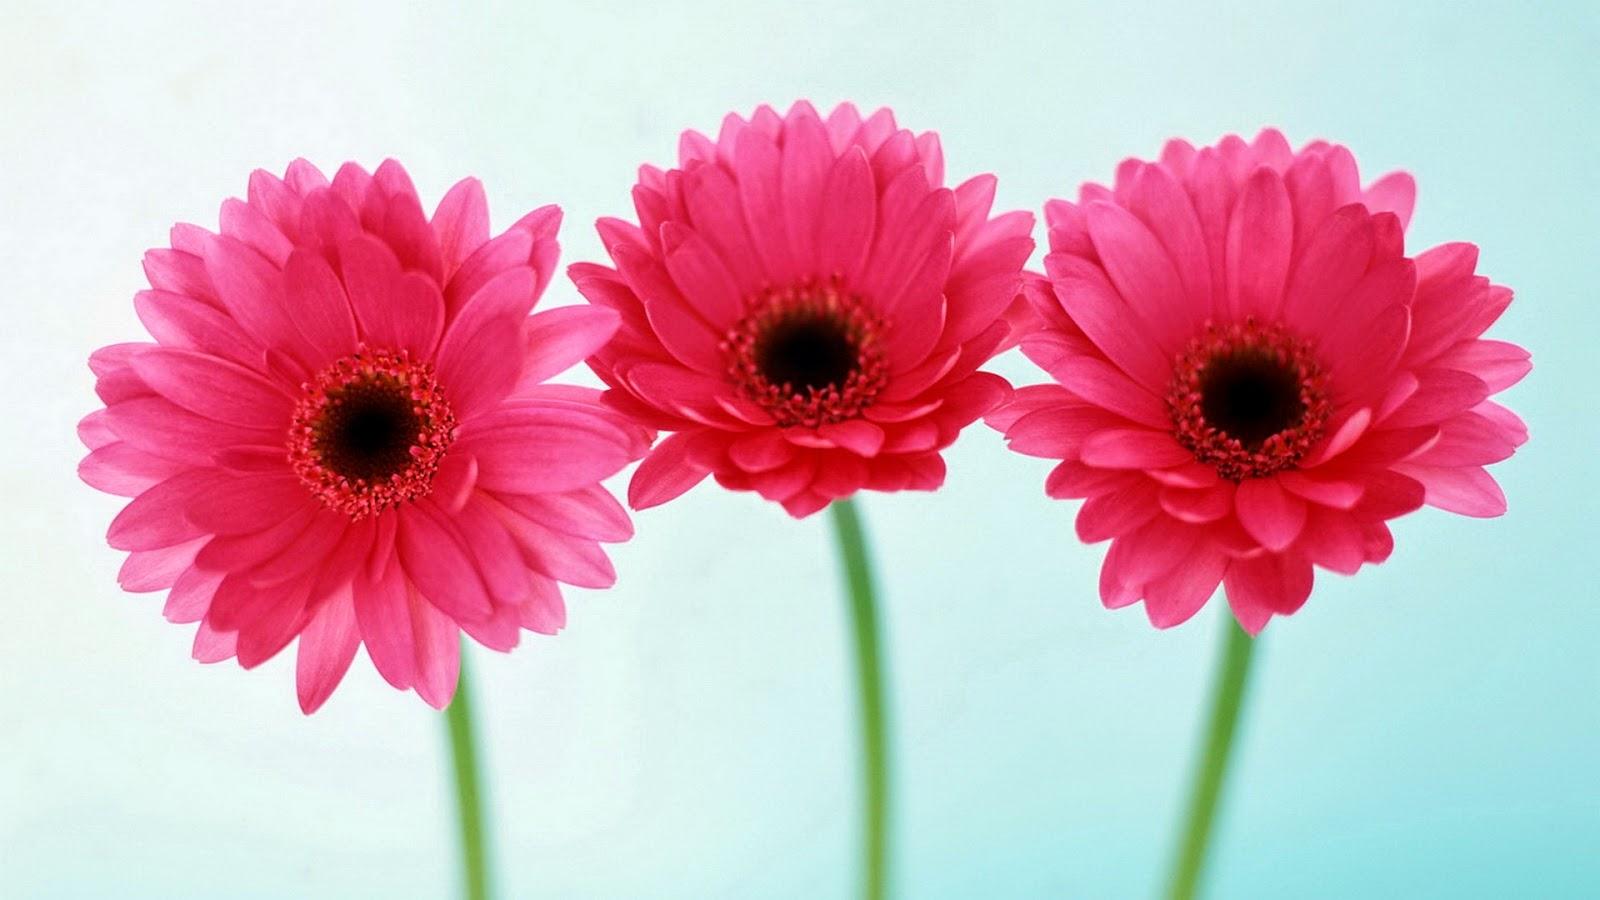 Pink Flower Wallpapers Background Hd Desktop Wallpapers Free Download